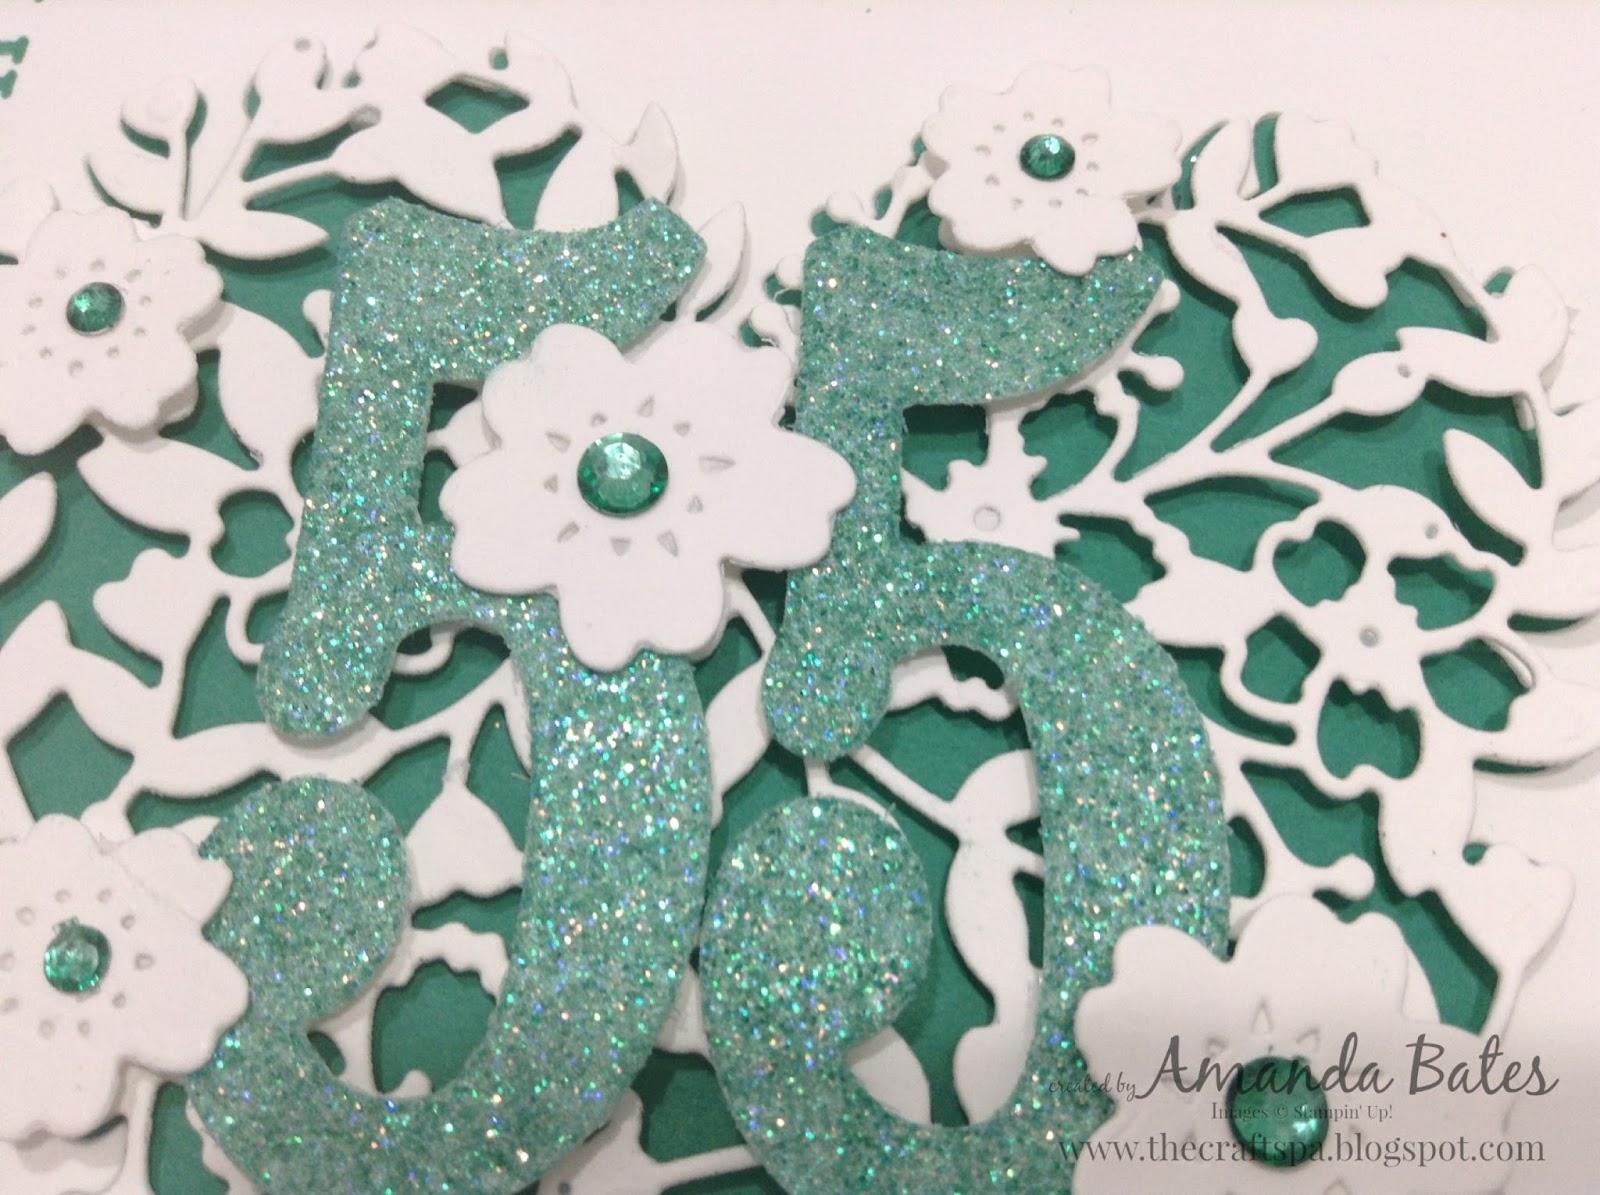 Emerald Wedding Anniversary Gifts: Stampin' Up! UK Independent Demonstrator